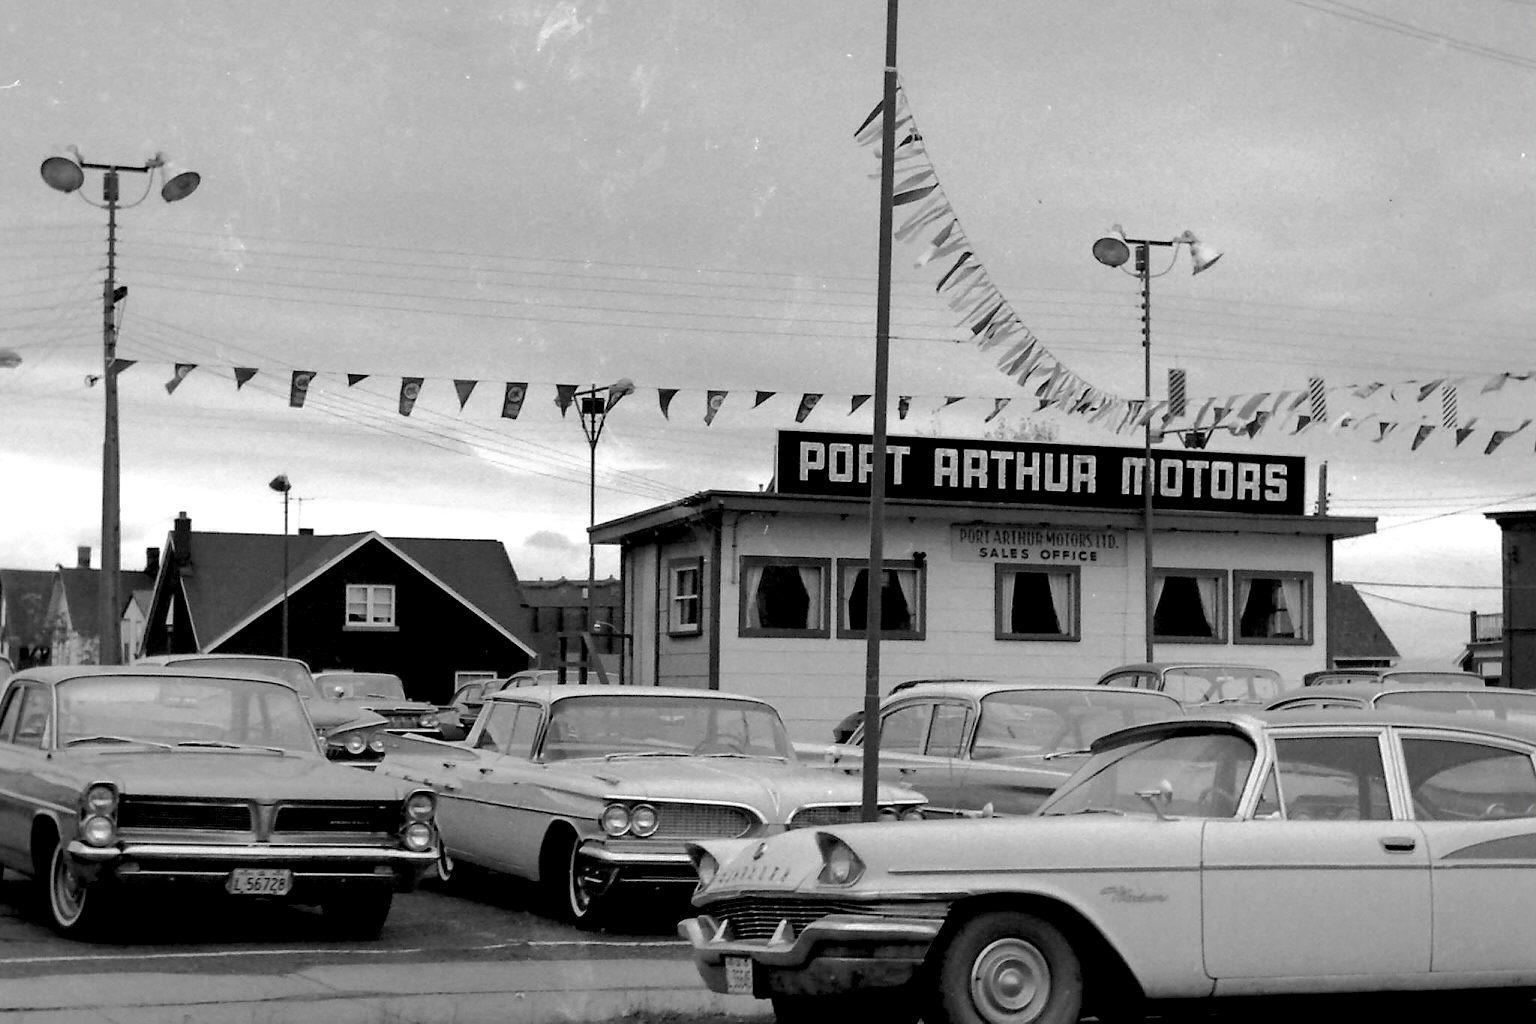 Garys Used Cars >> HOT RODS and JALOPIES: Port Arthur Motors, Kam Motors ...